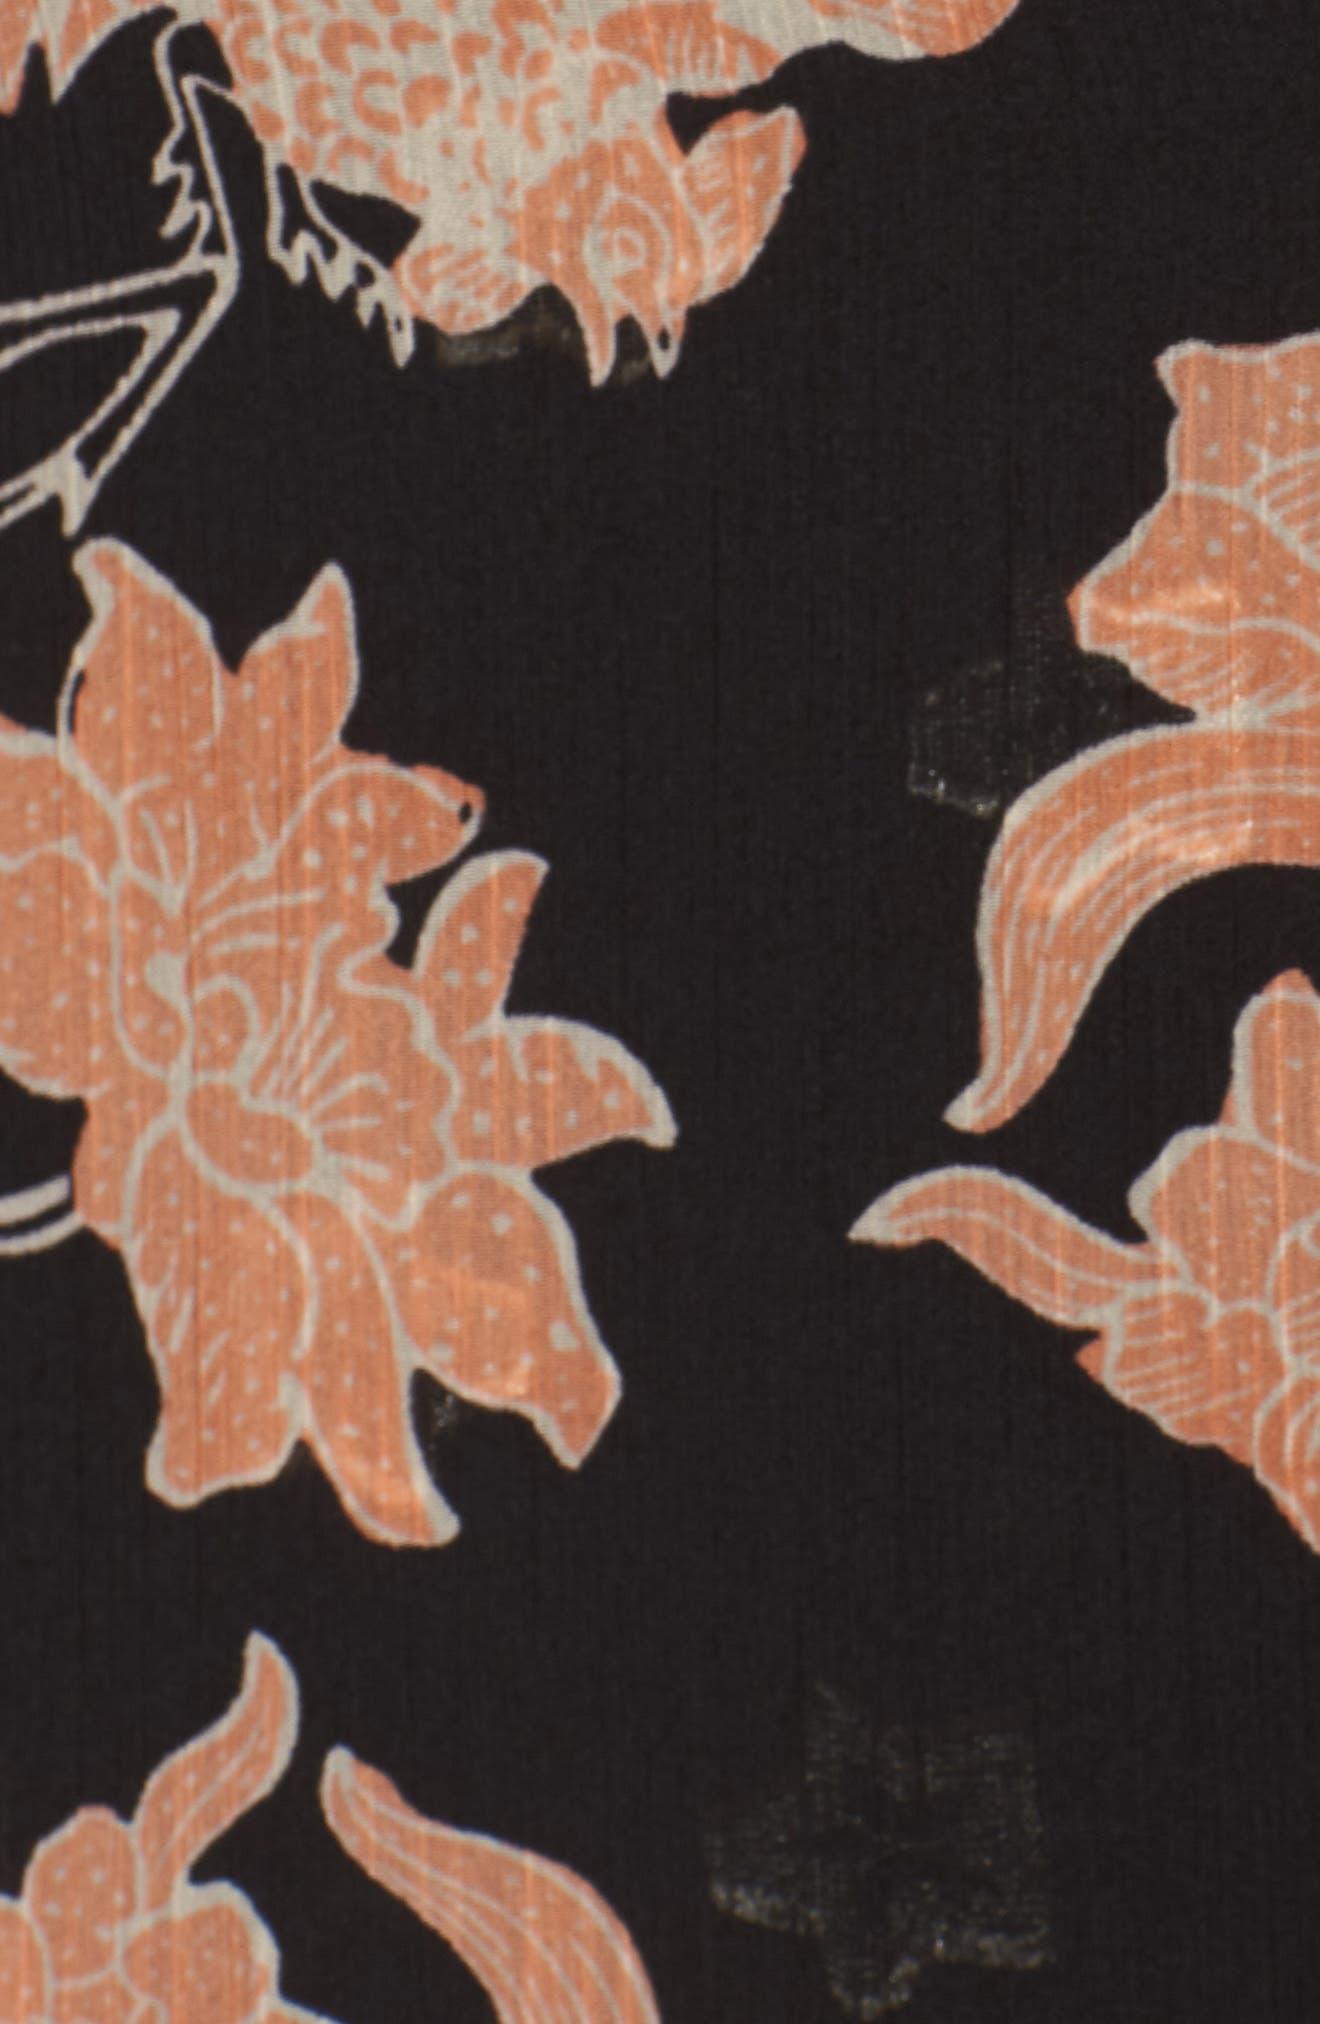 Floral Print Drape Duster Jacket,                             Alternate thumbnail 7, color,                             001